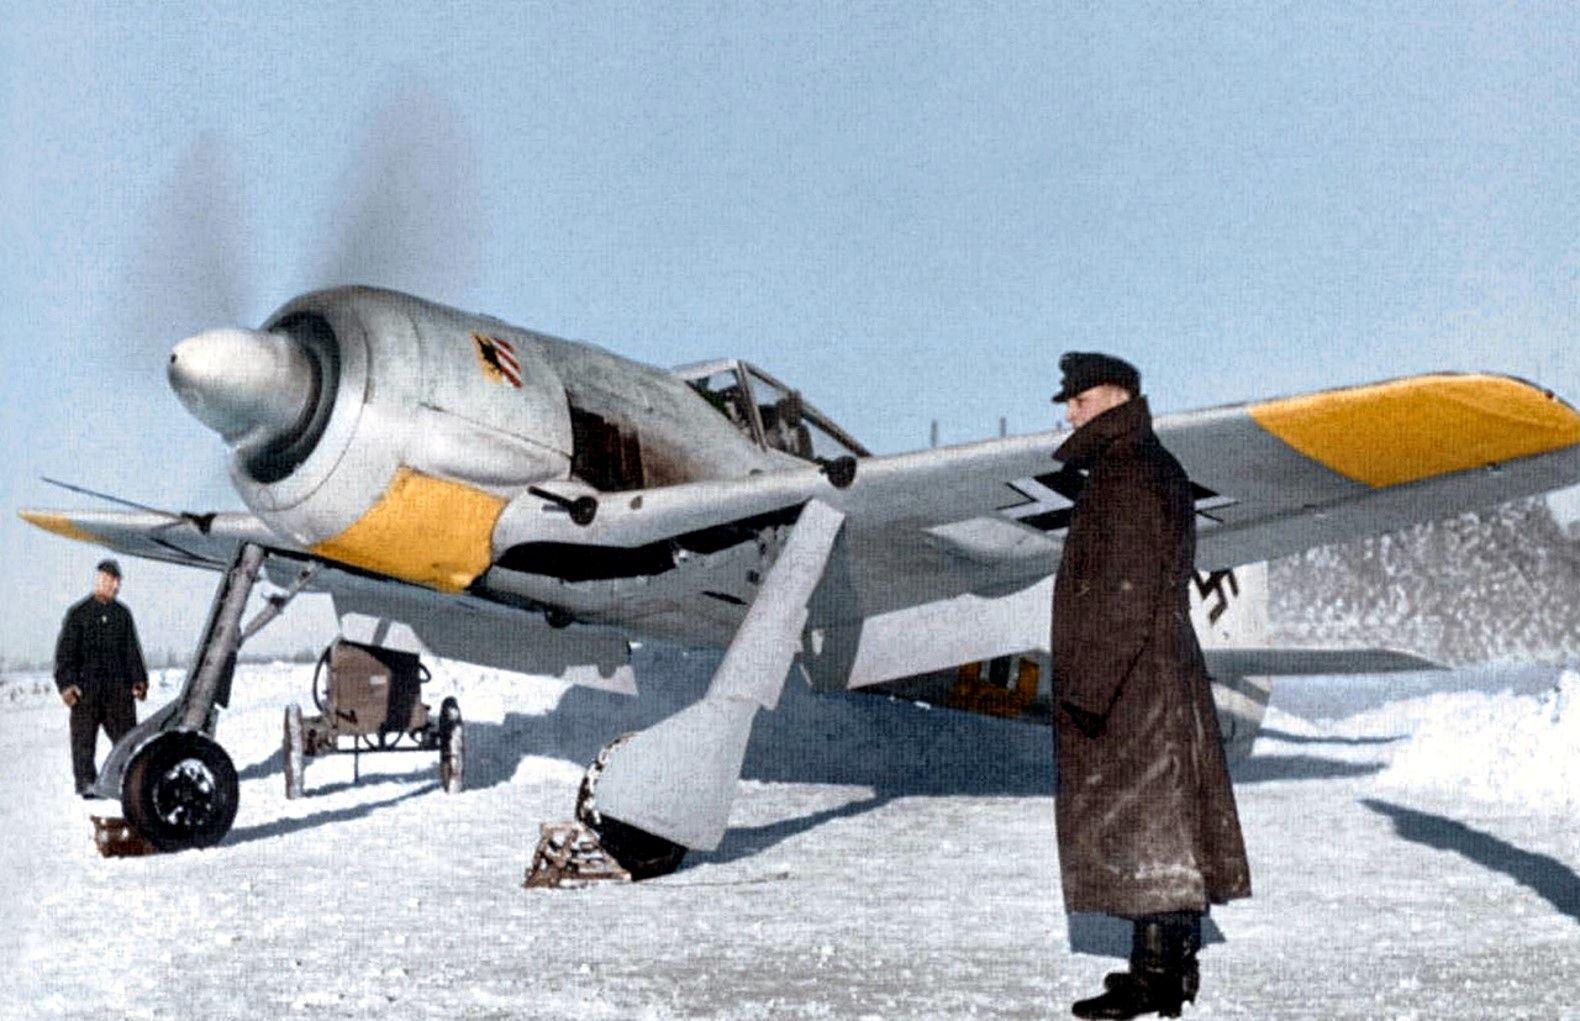 fw-190 winter.jpg